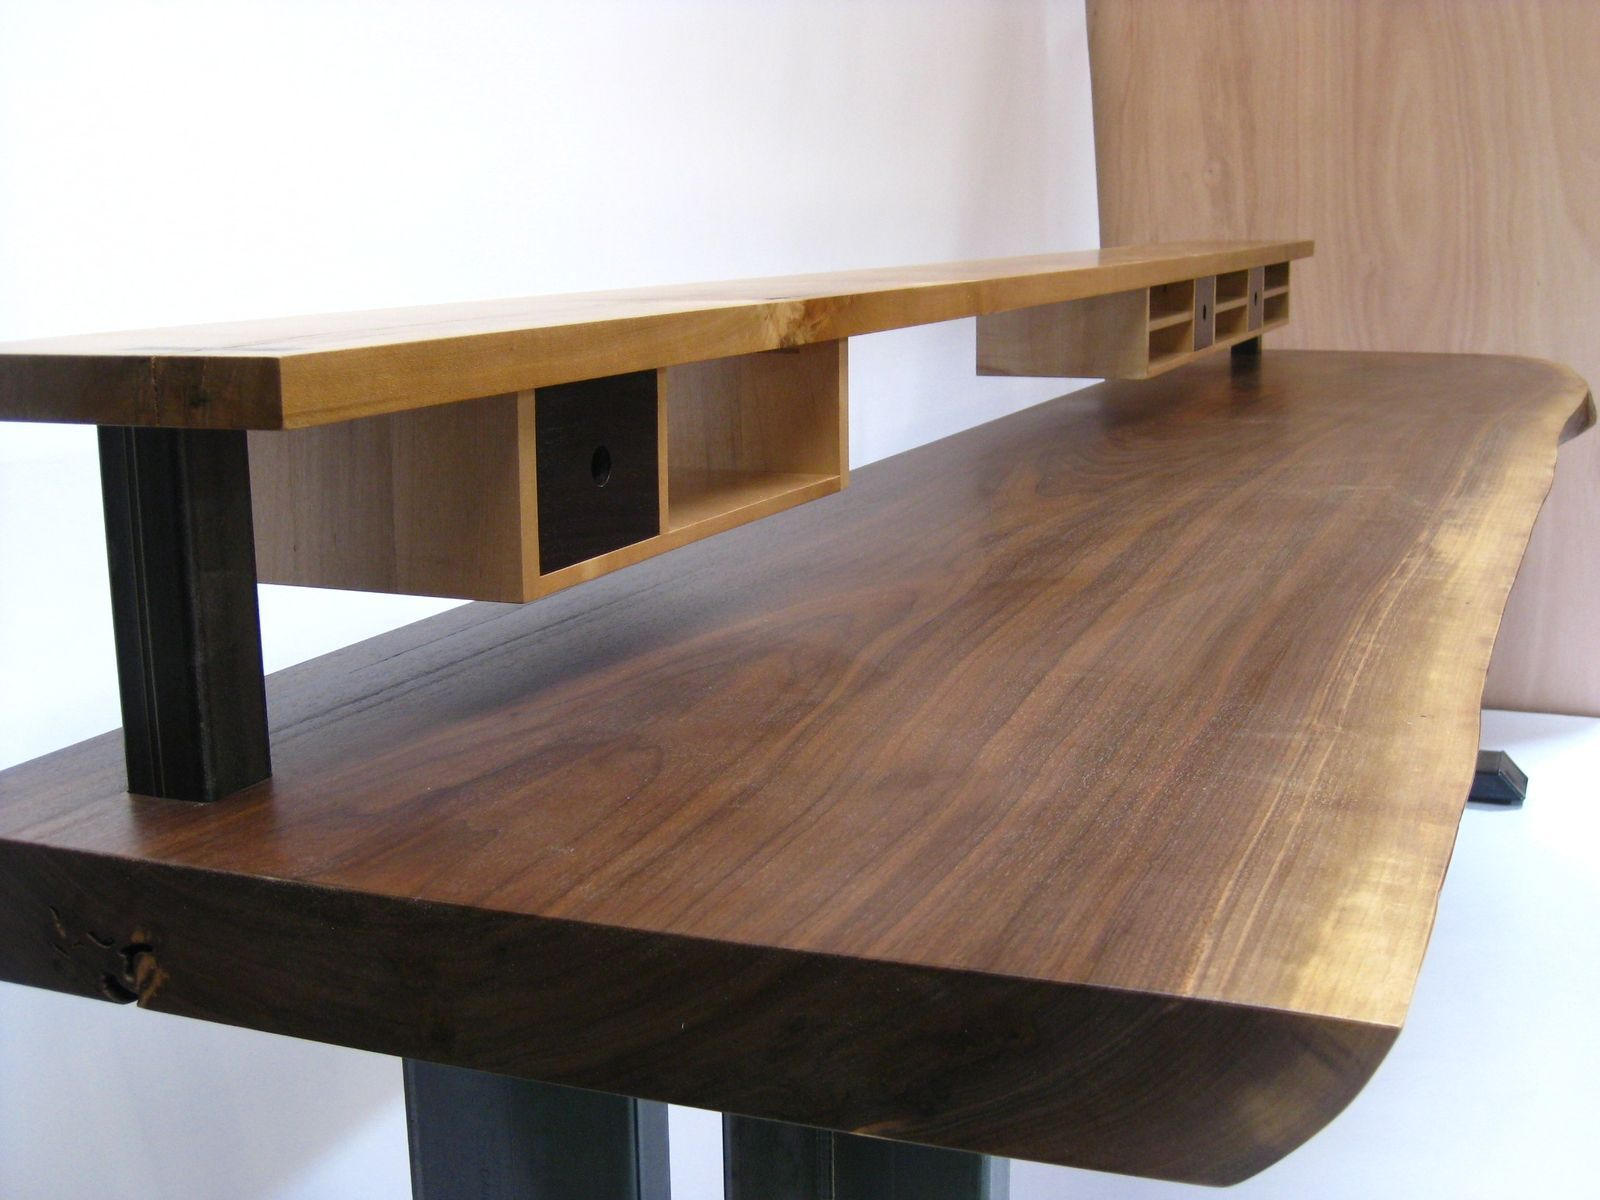 Custom Made Walnut Slab Desk With Shelving And Drawers Walnut Slab Desk Slab Desk House